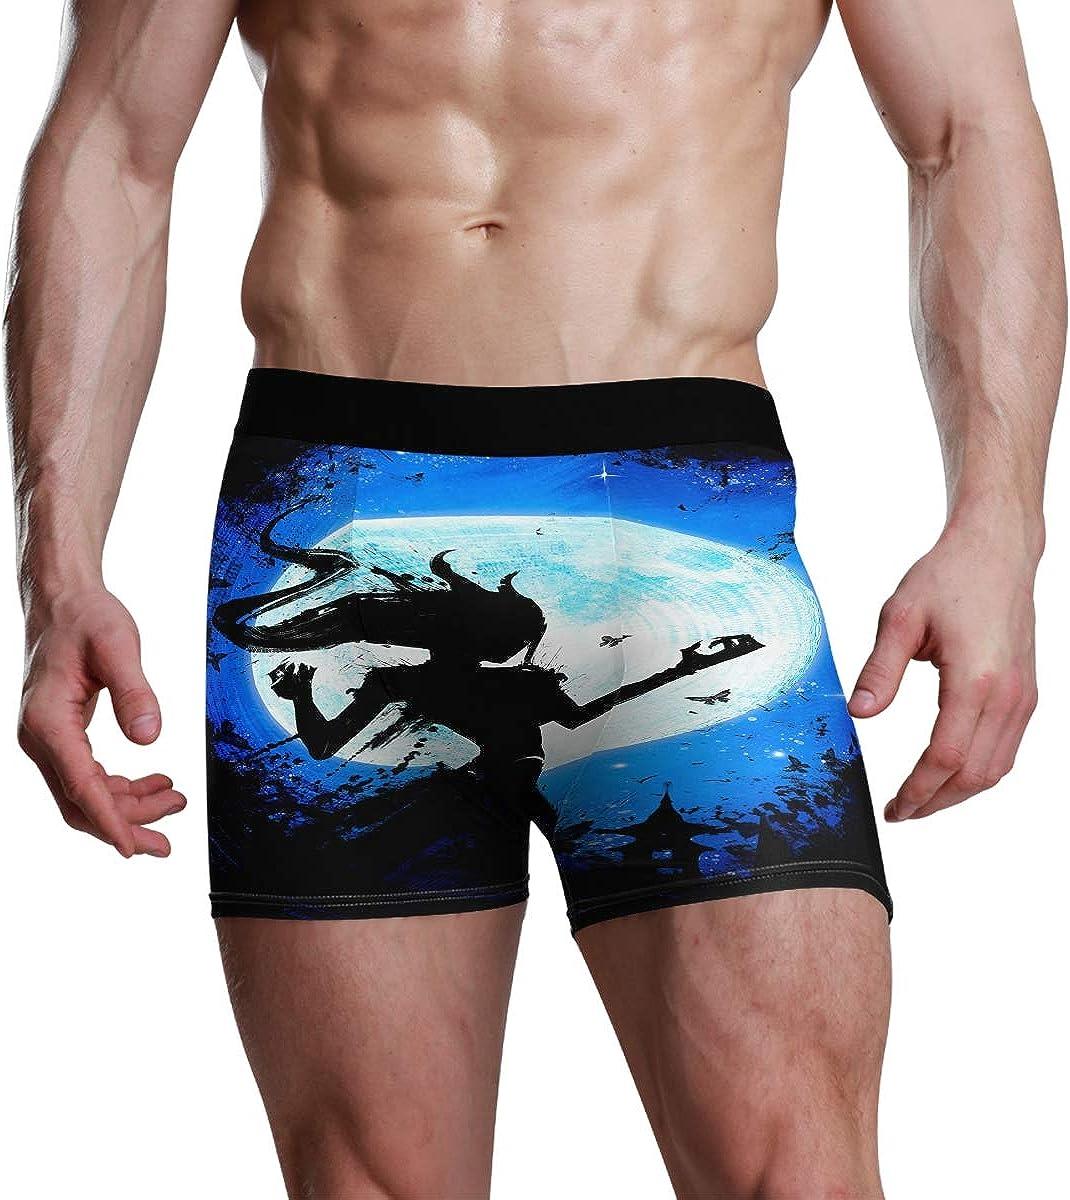 Men's Boxer Briefs Girl Werewolf in Motion Blue Bikini Underwear Stretch Trunks Boys Underpants